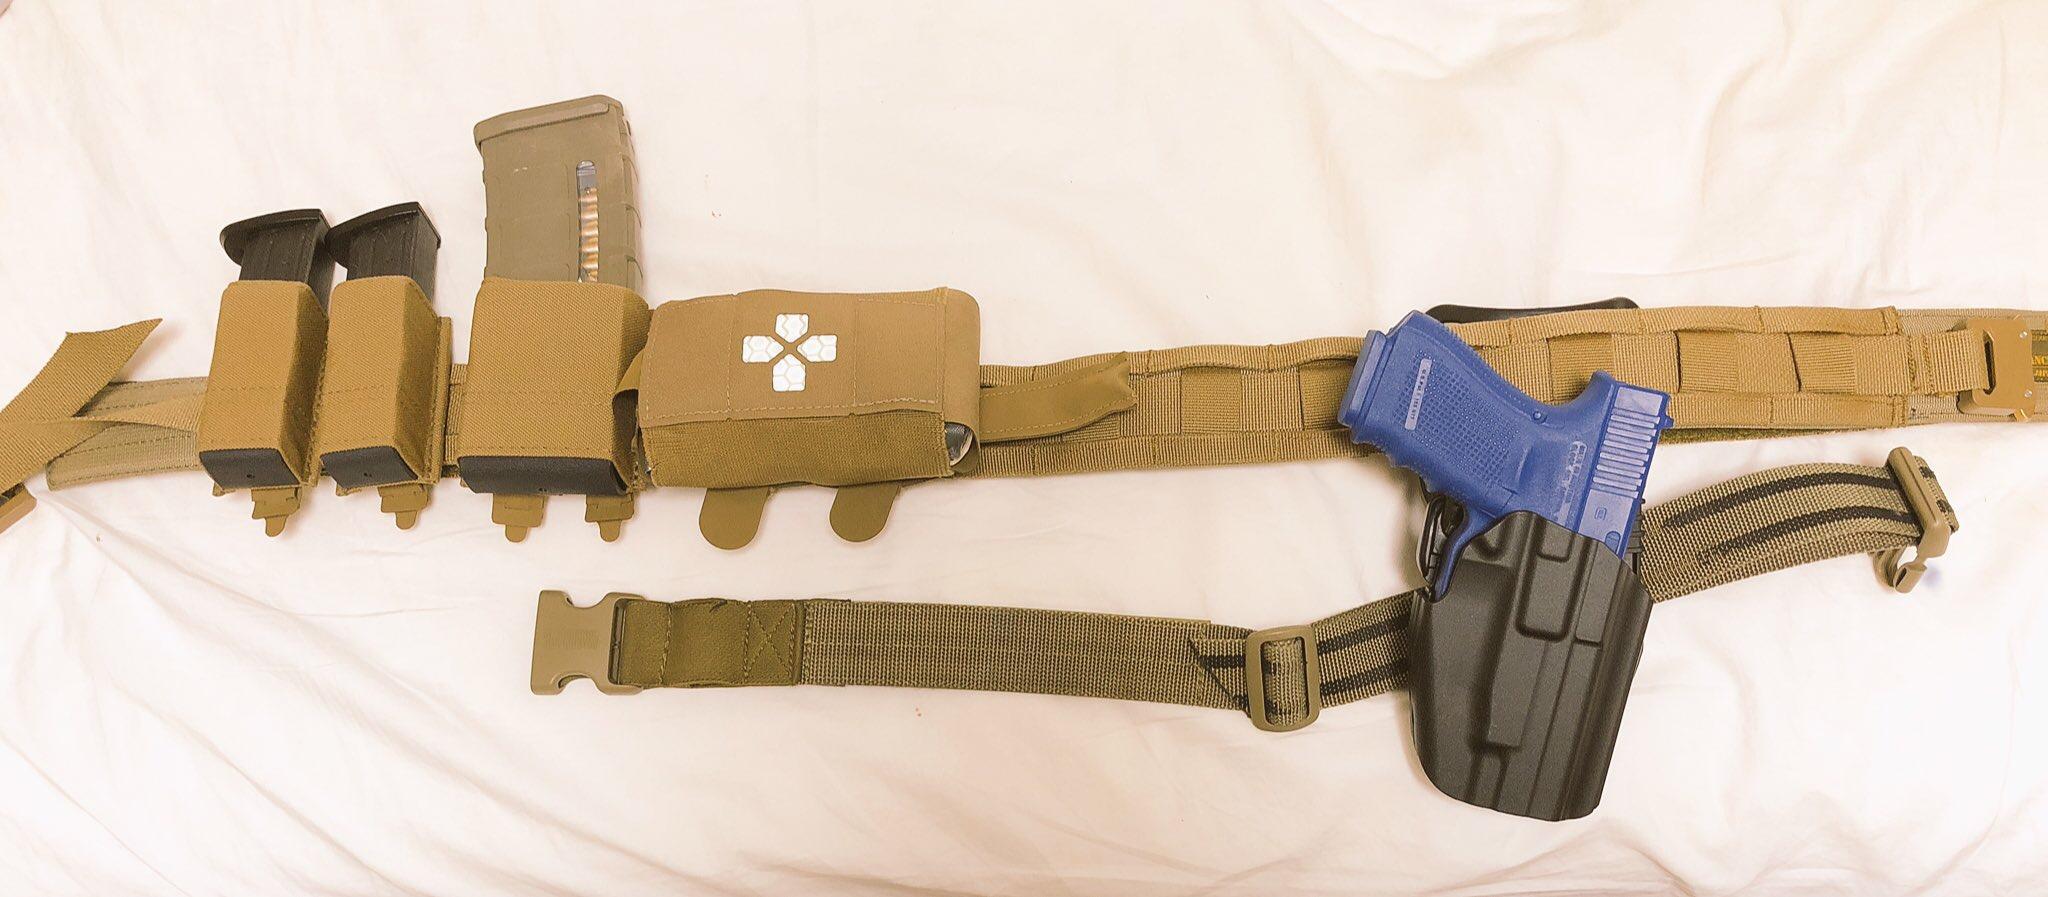 B7BE4089 9A27 4F4B 98B1 D0469DA36BC3 - 腰装備のセットアップ